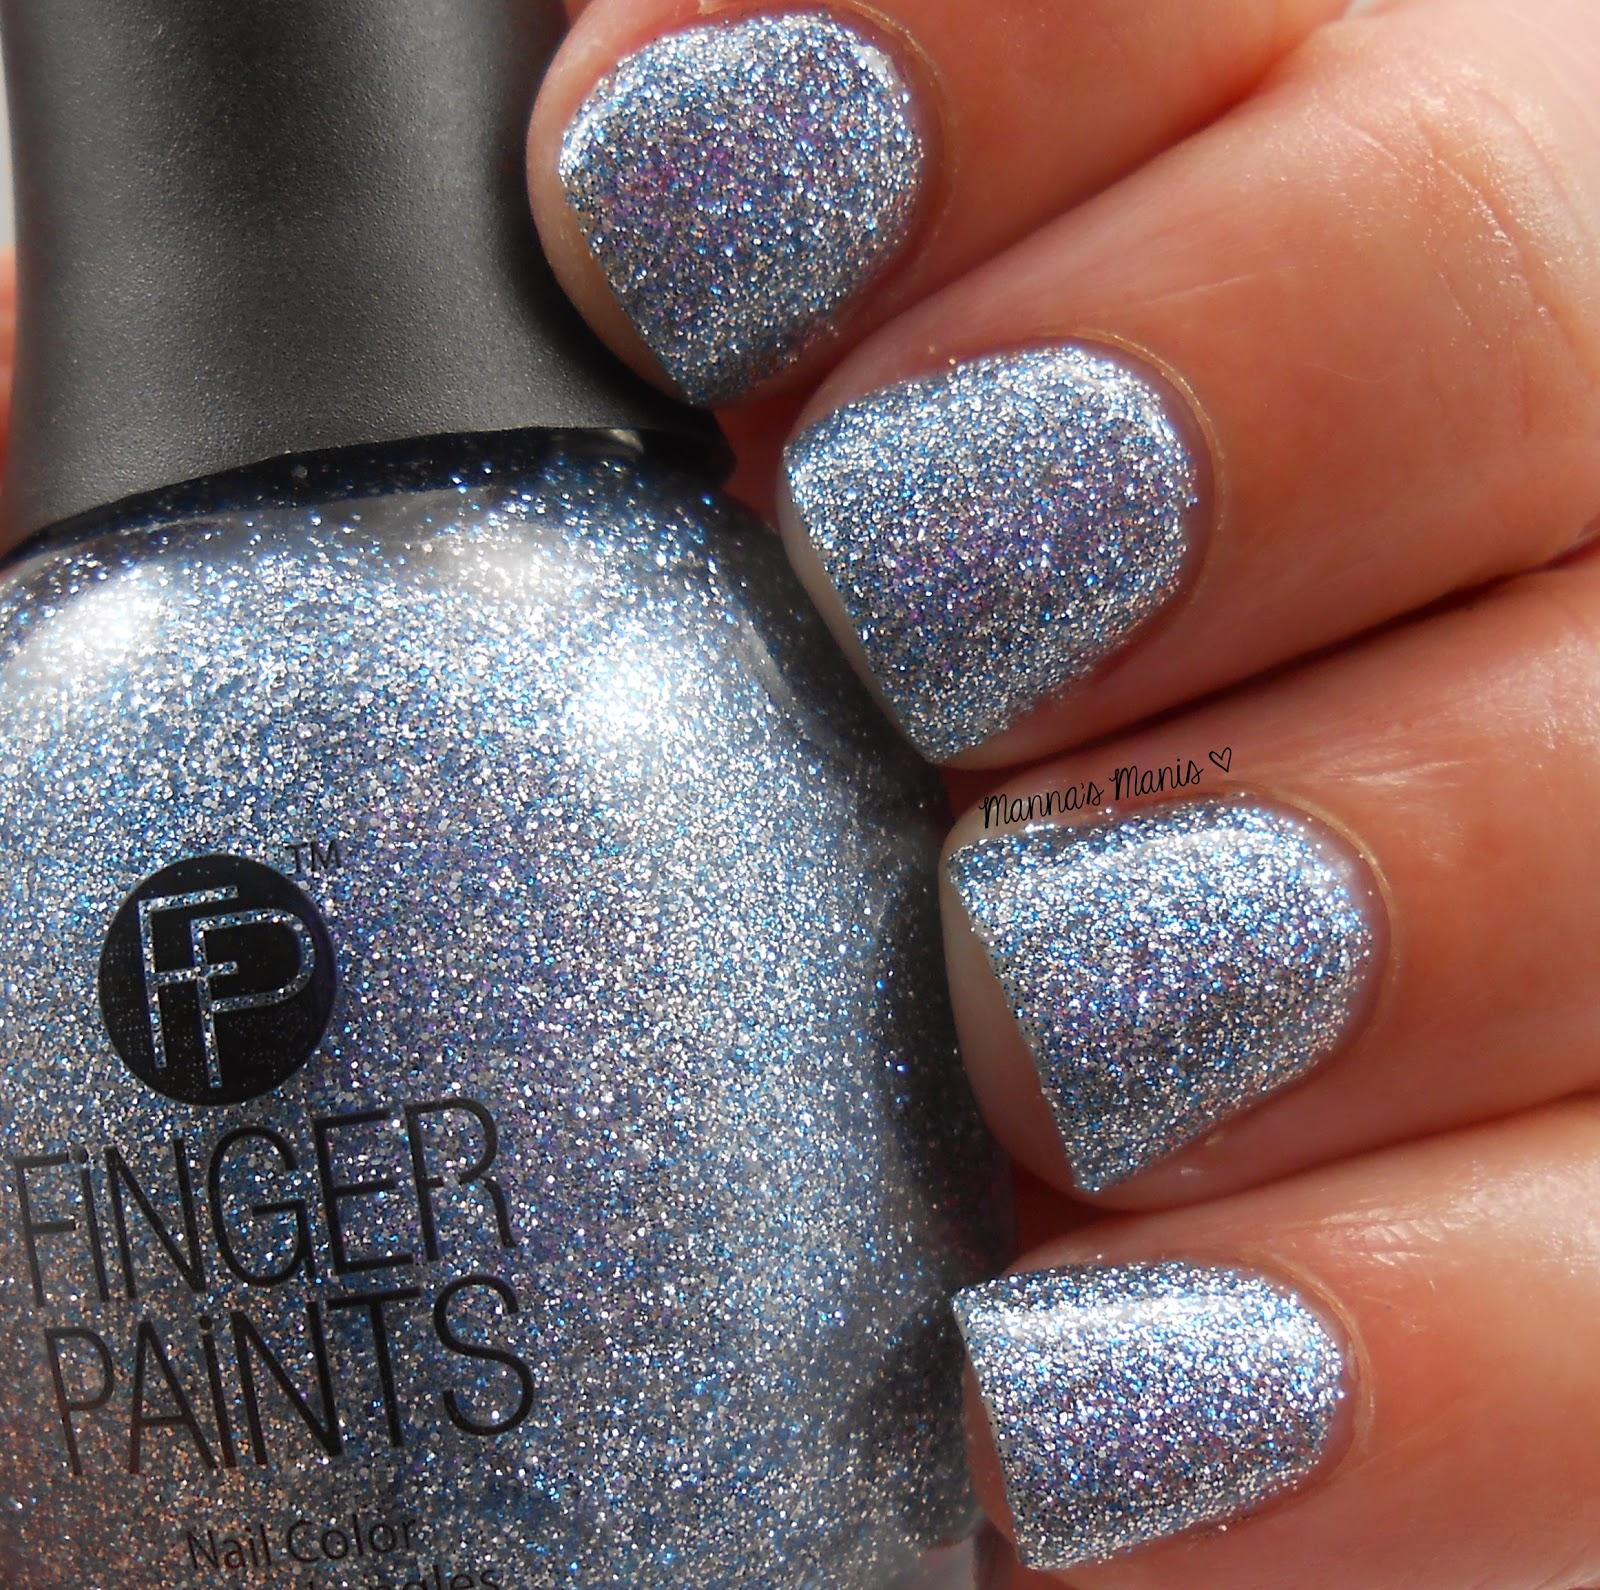 fingerpaints Ho Ho Happy Holidays, a full coverage bluish silver microglitter nail polish